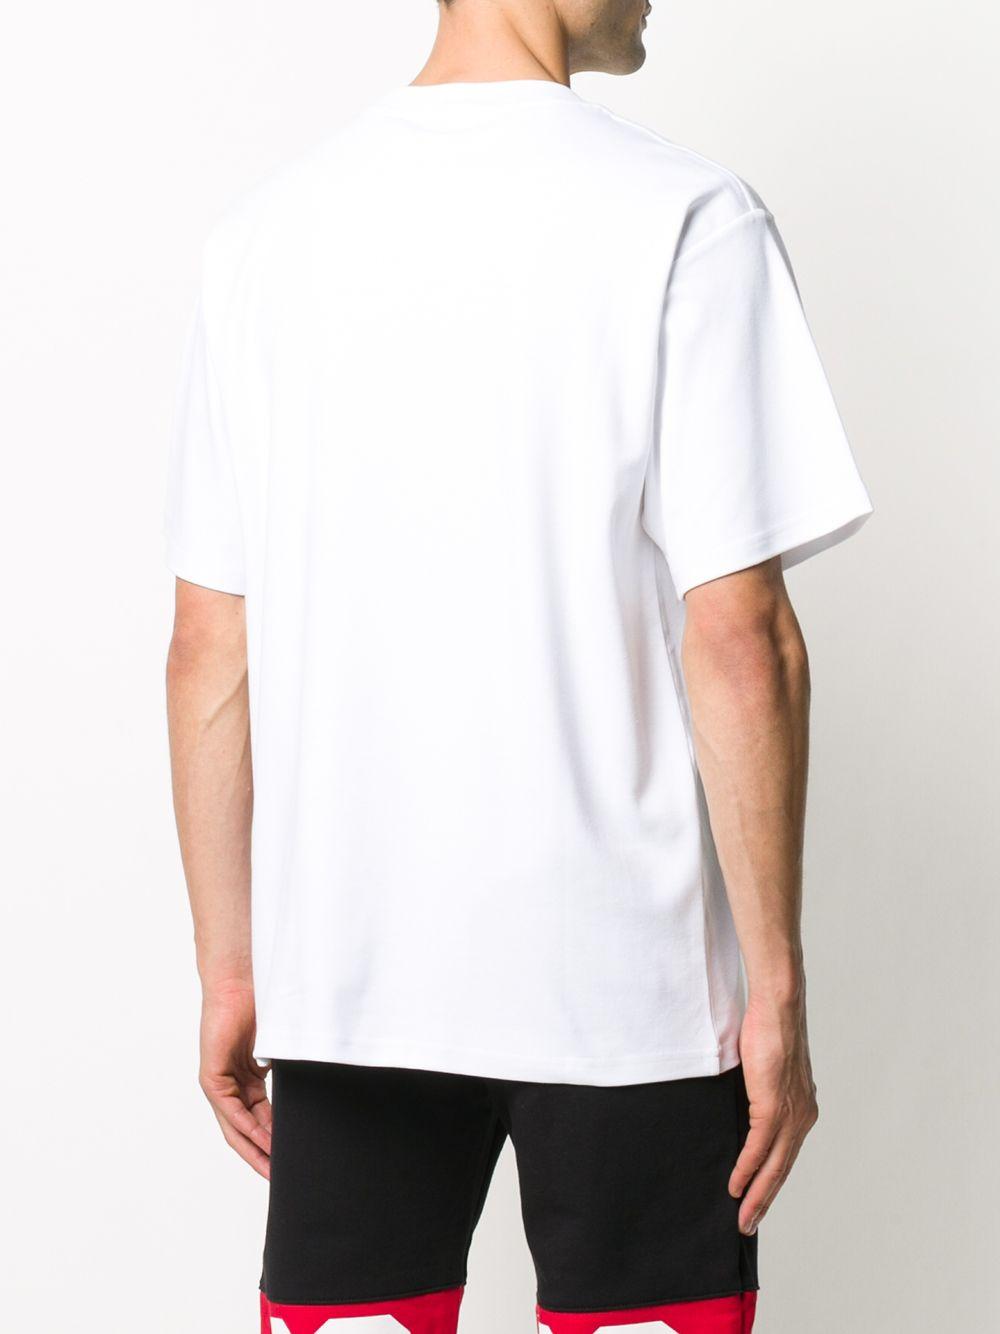 T-SHIRT BIANCA GCDS | T-shirt | FW21M02005601